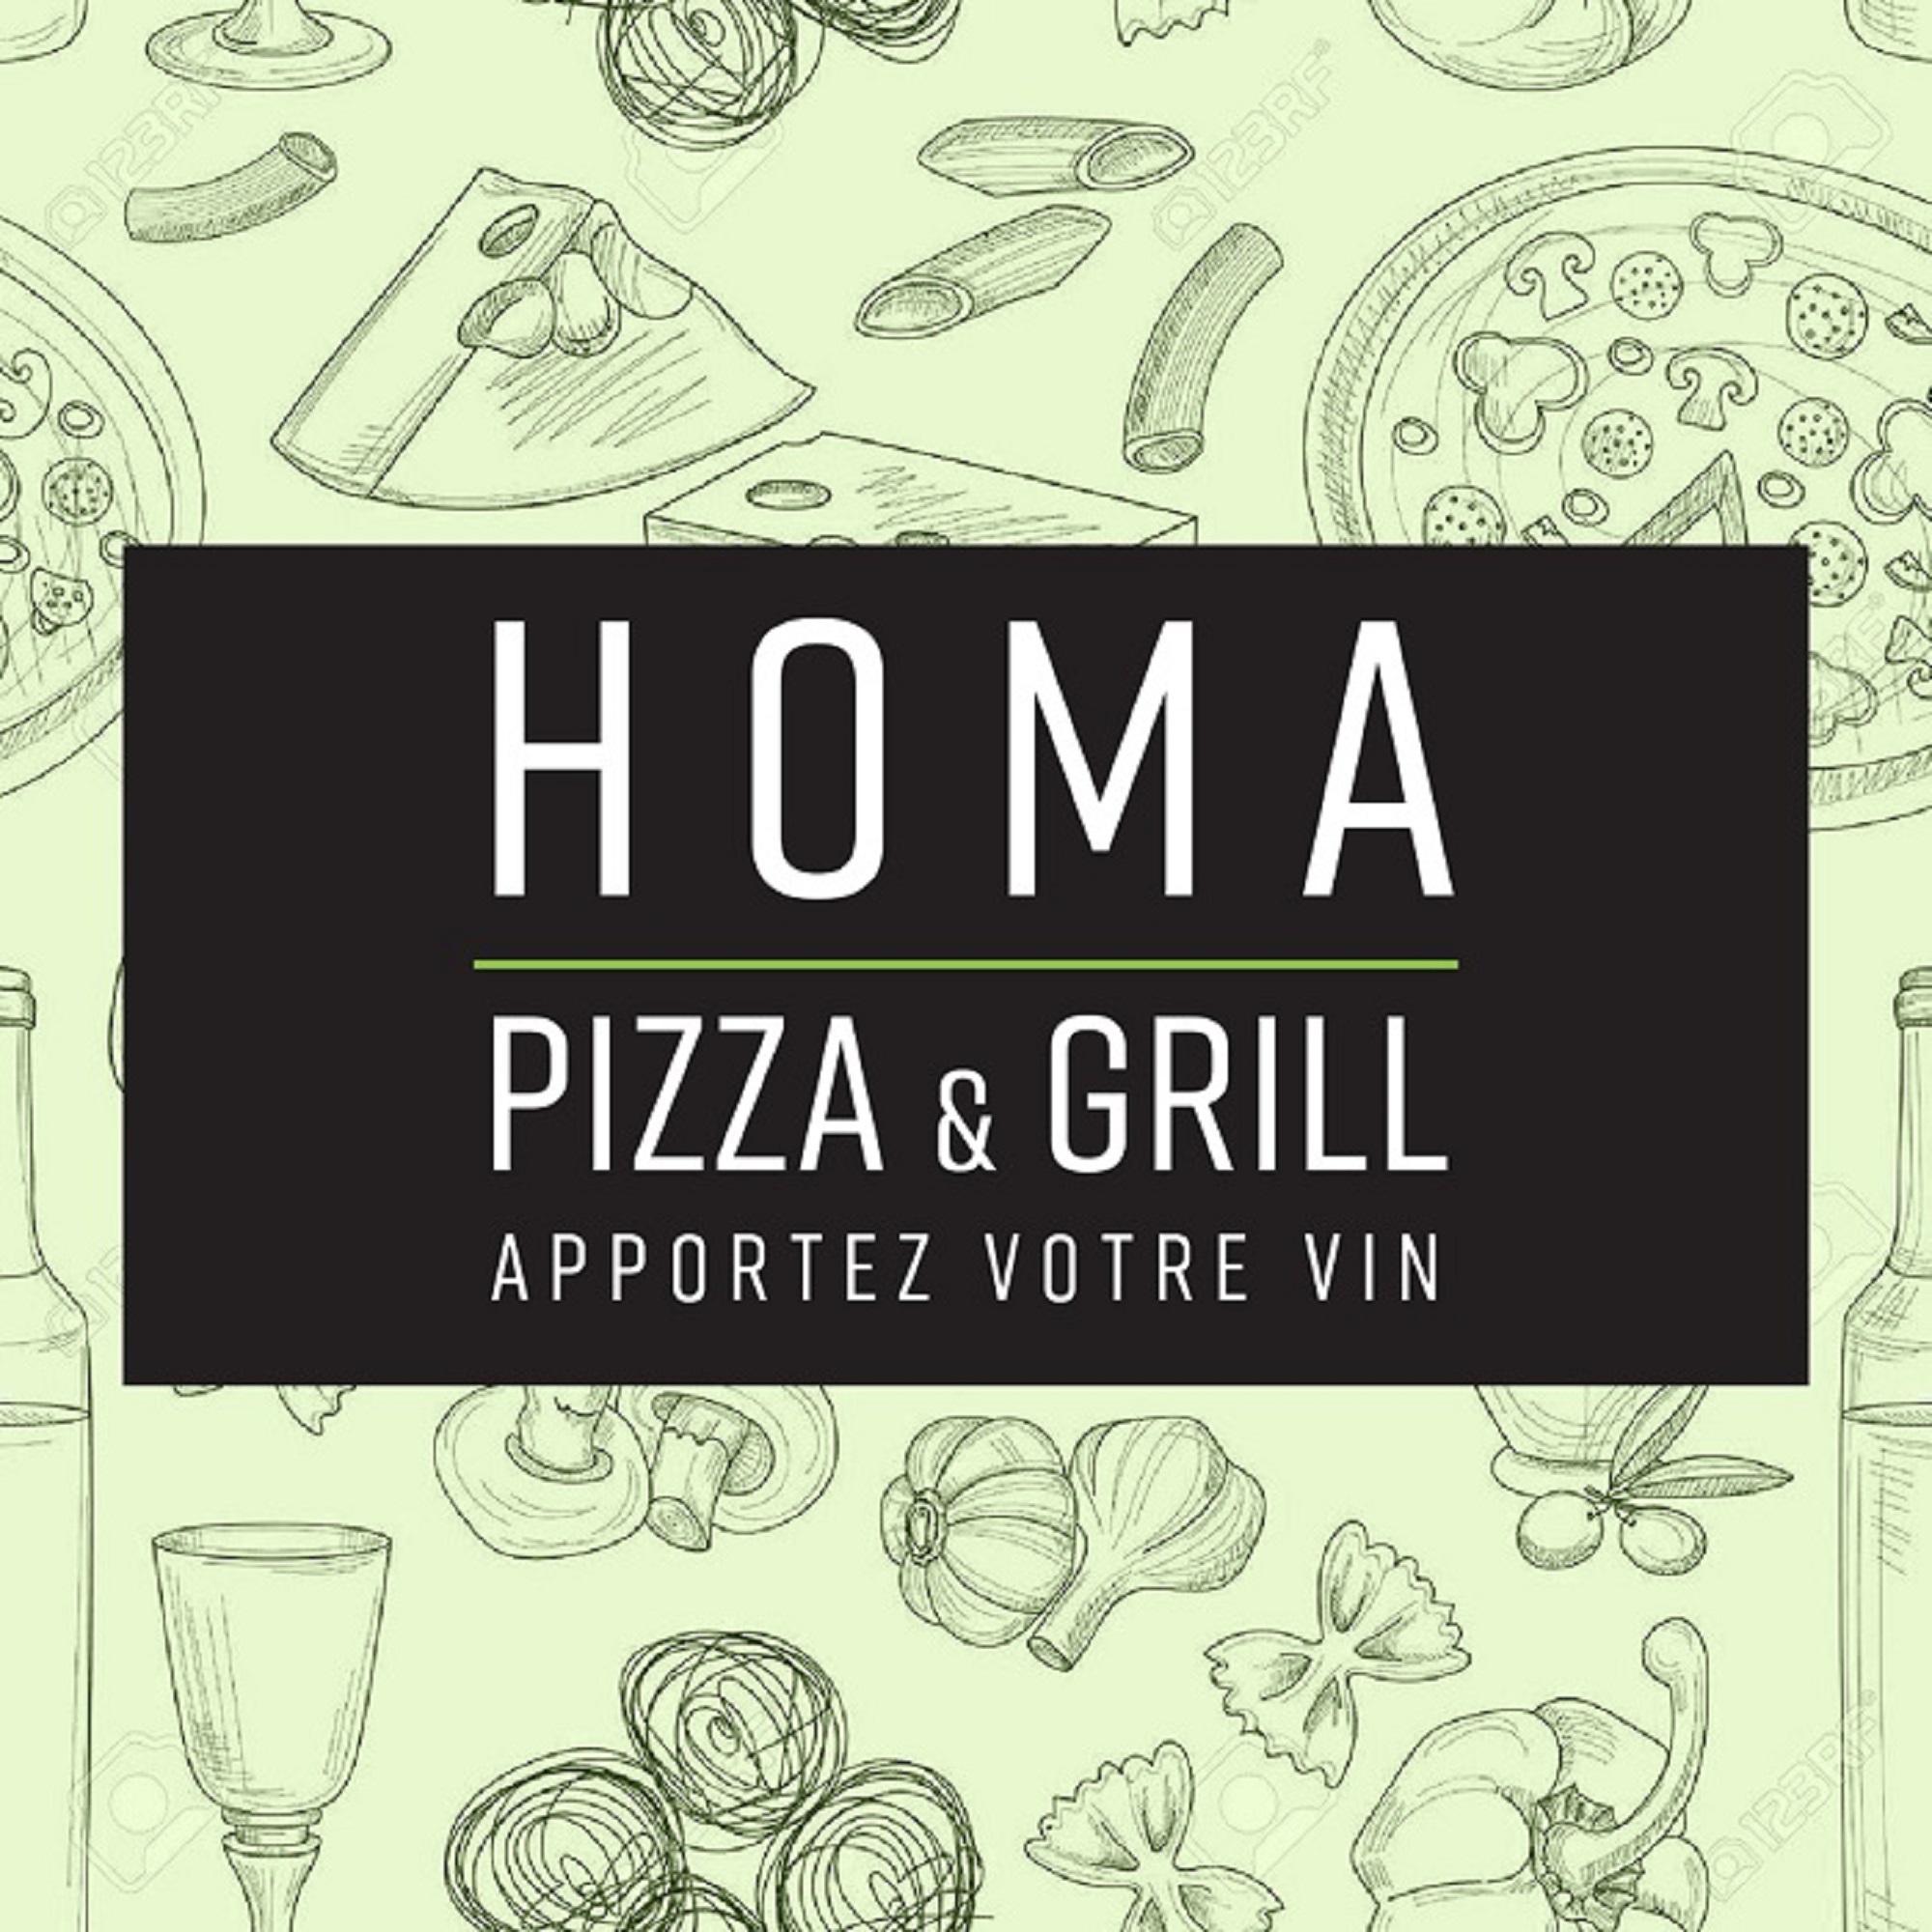 Restaurant Homa